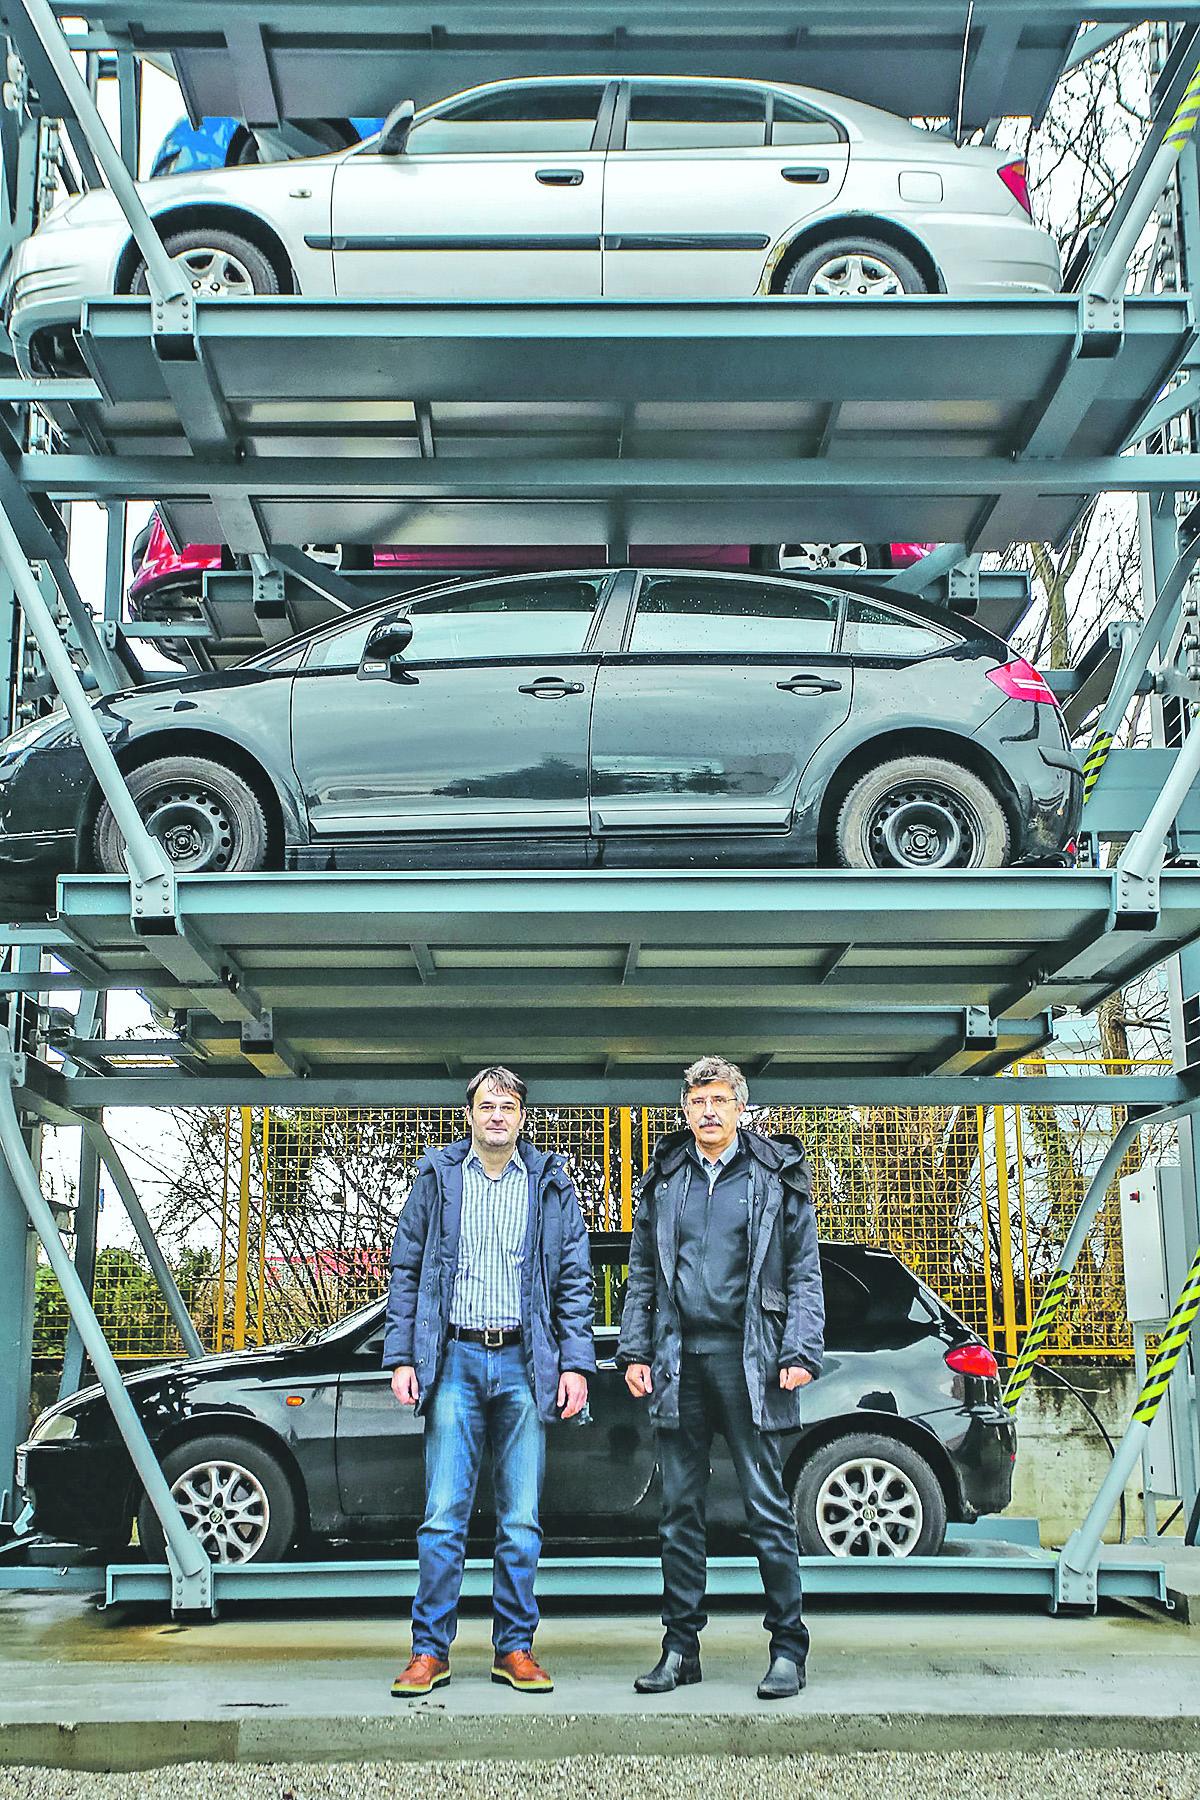 Inovativni parking sustav Rotary parking tvrtke Europark Systems.Na fotografiji: voditelji projekta Ivan Gudelj i Zvonimir Prljić